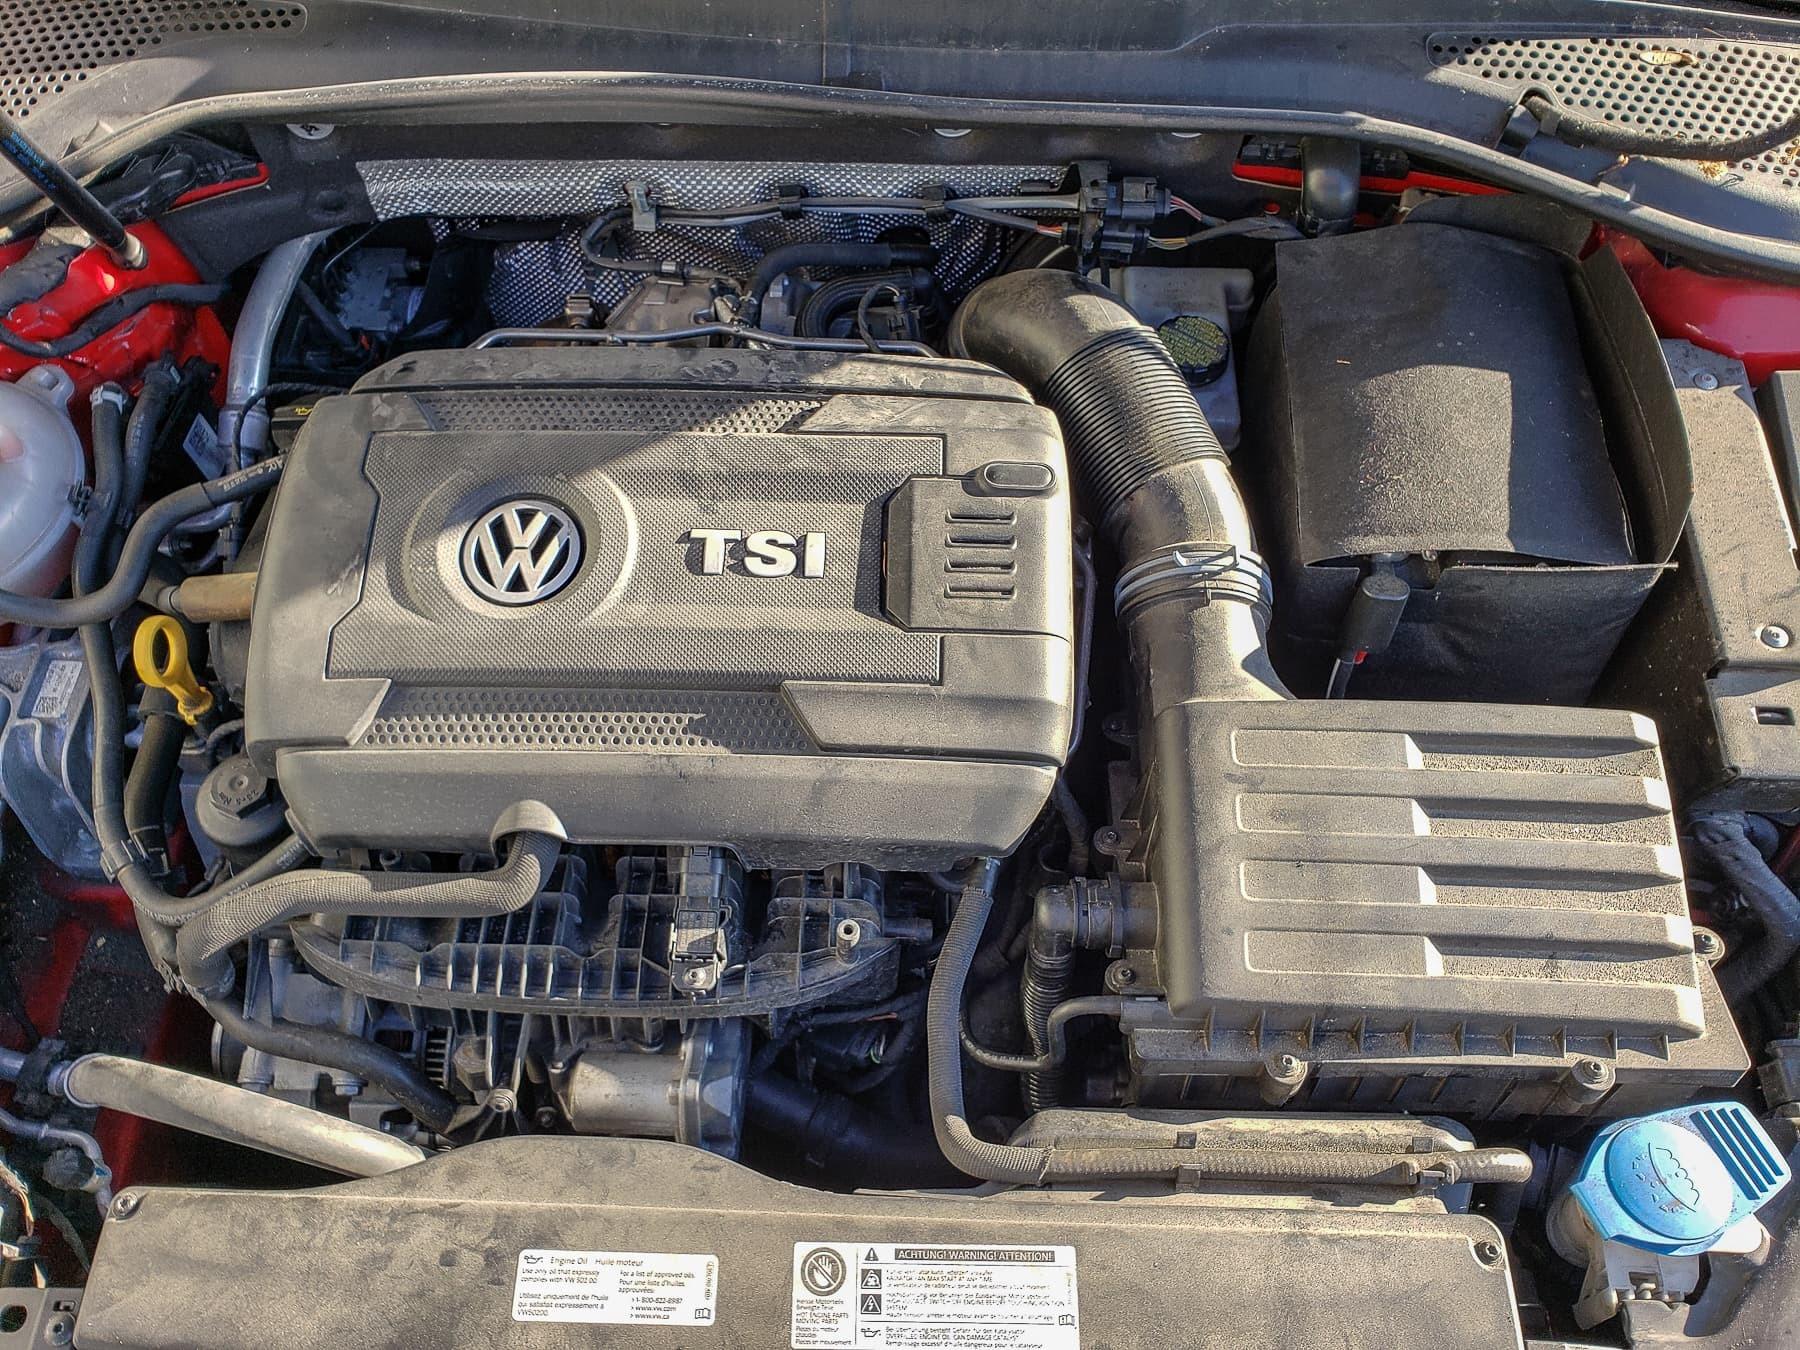 2017 VW Golf, Maintenance Services